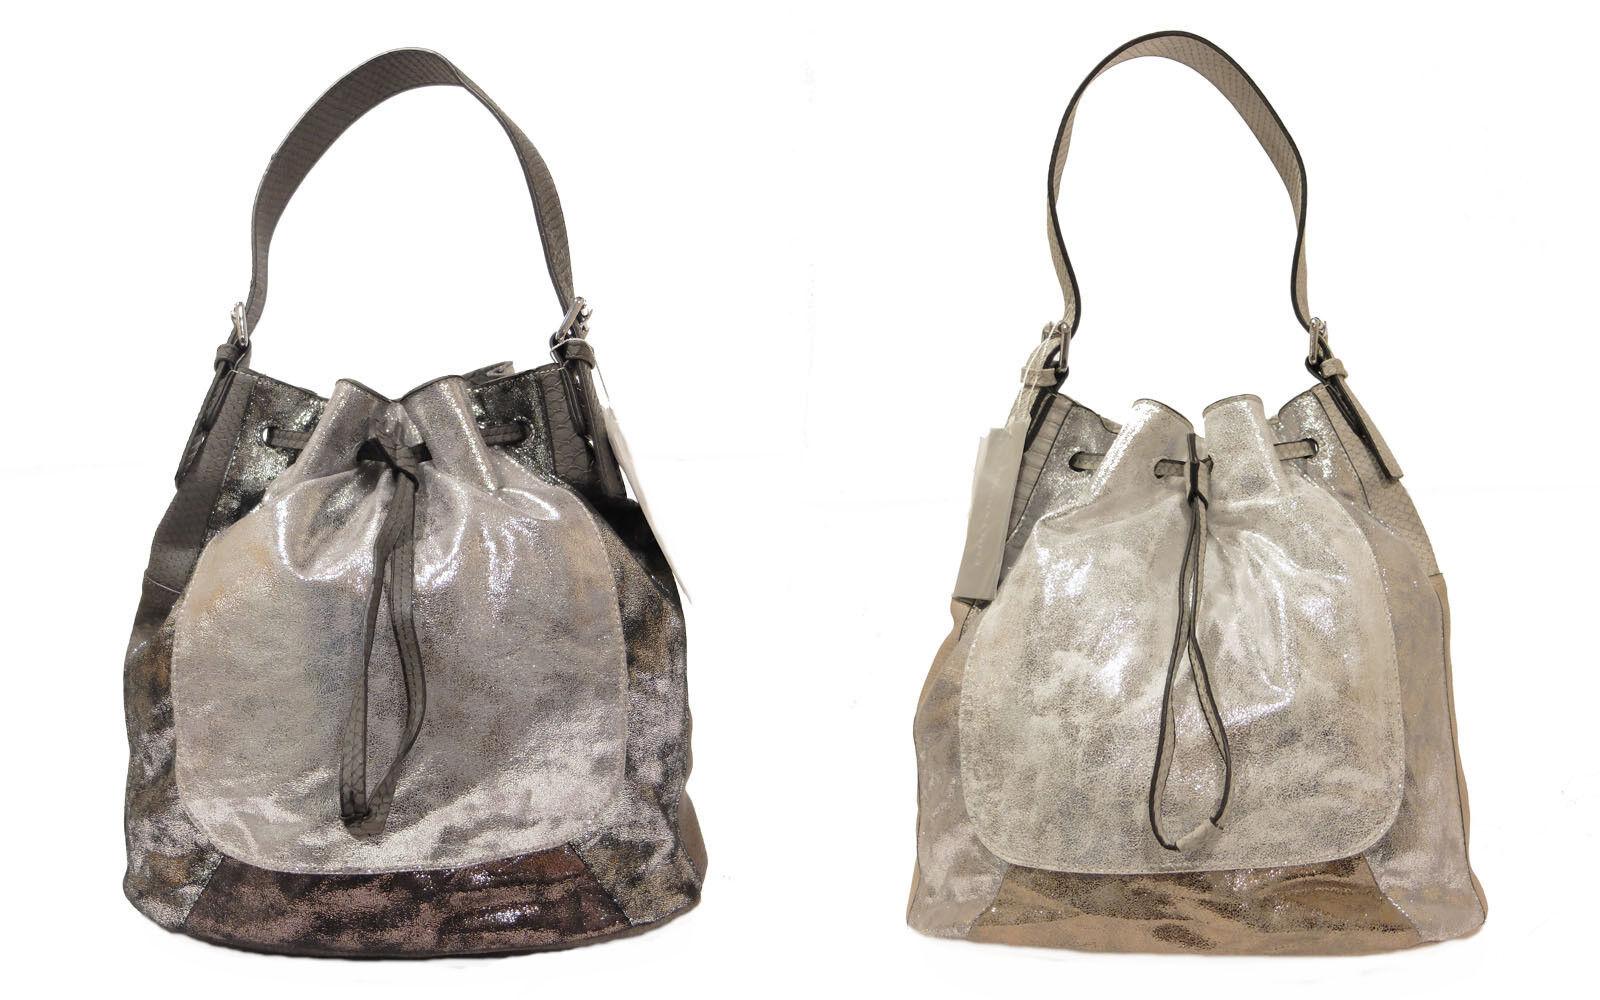 Emily & Noah Handtasche Beutel Schultertasche Tasche IN-Bag Metallic, NEU   Sale